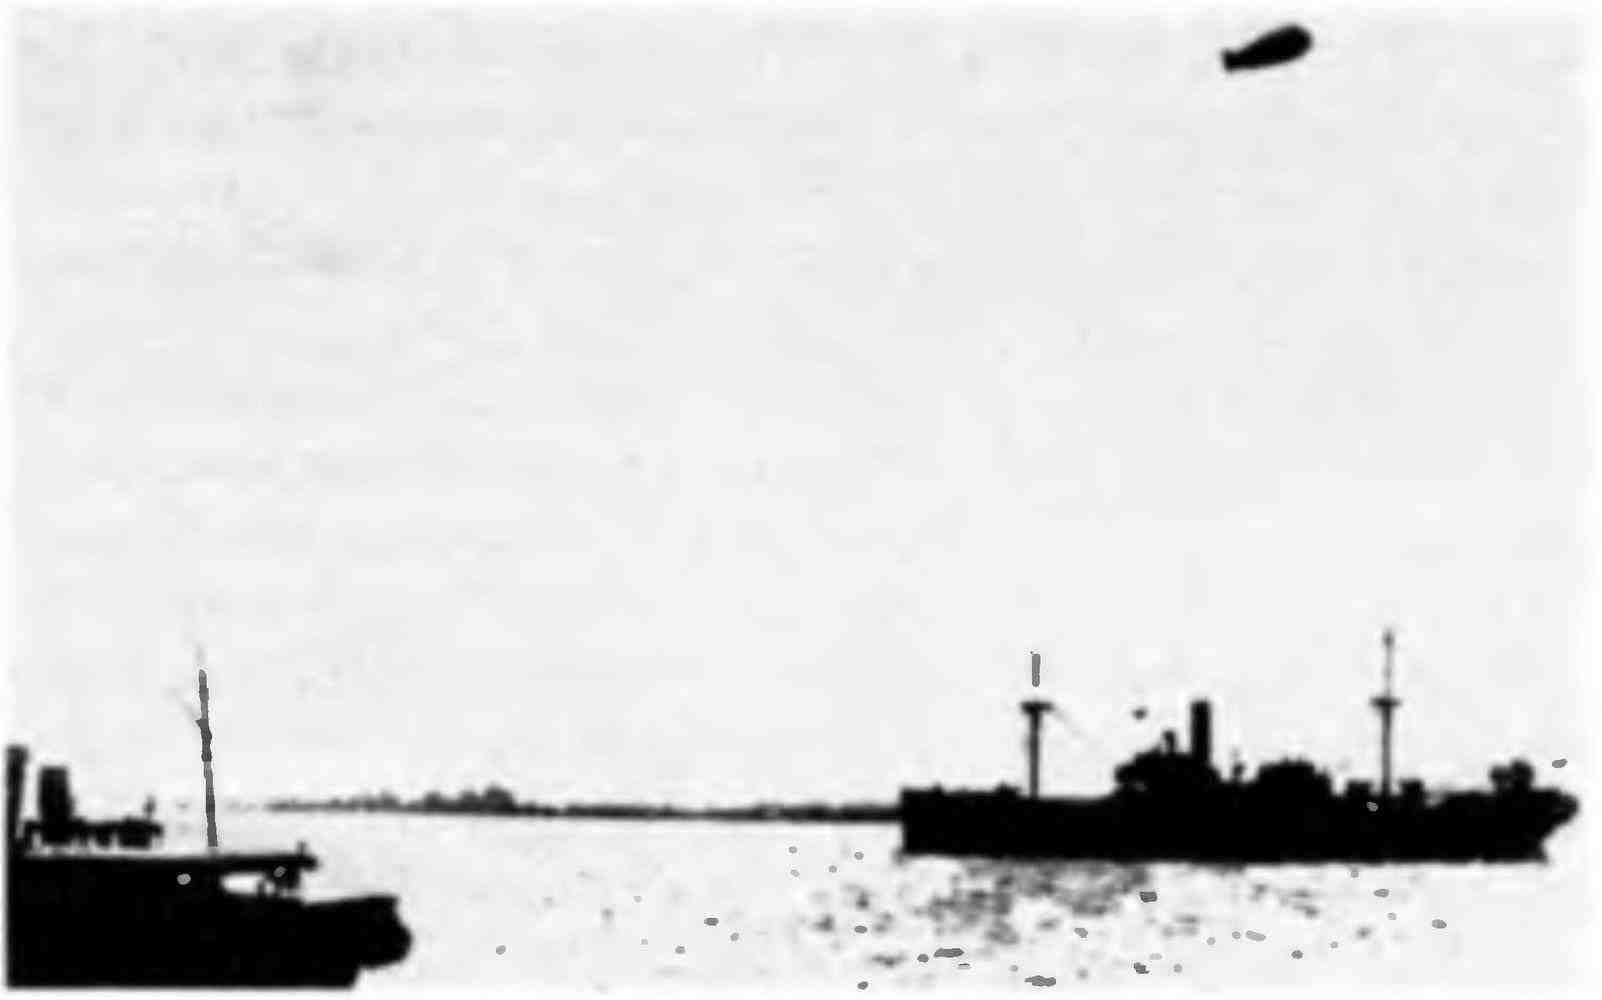 Суда конвоя PQ-18 в Архангельске. Сентябрь 1942 года.